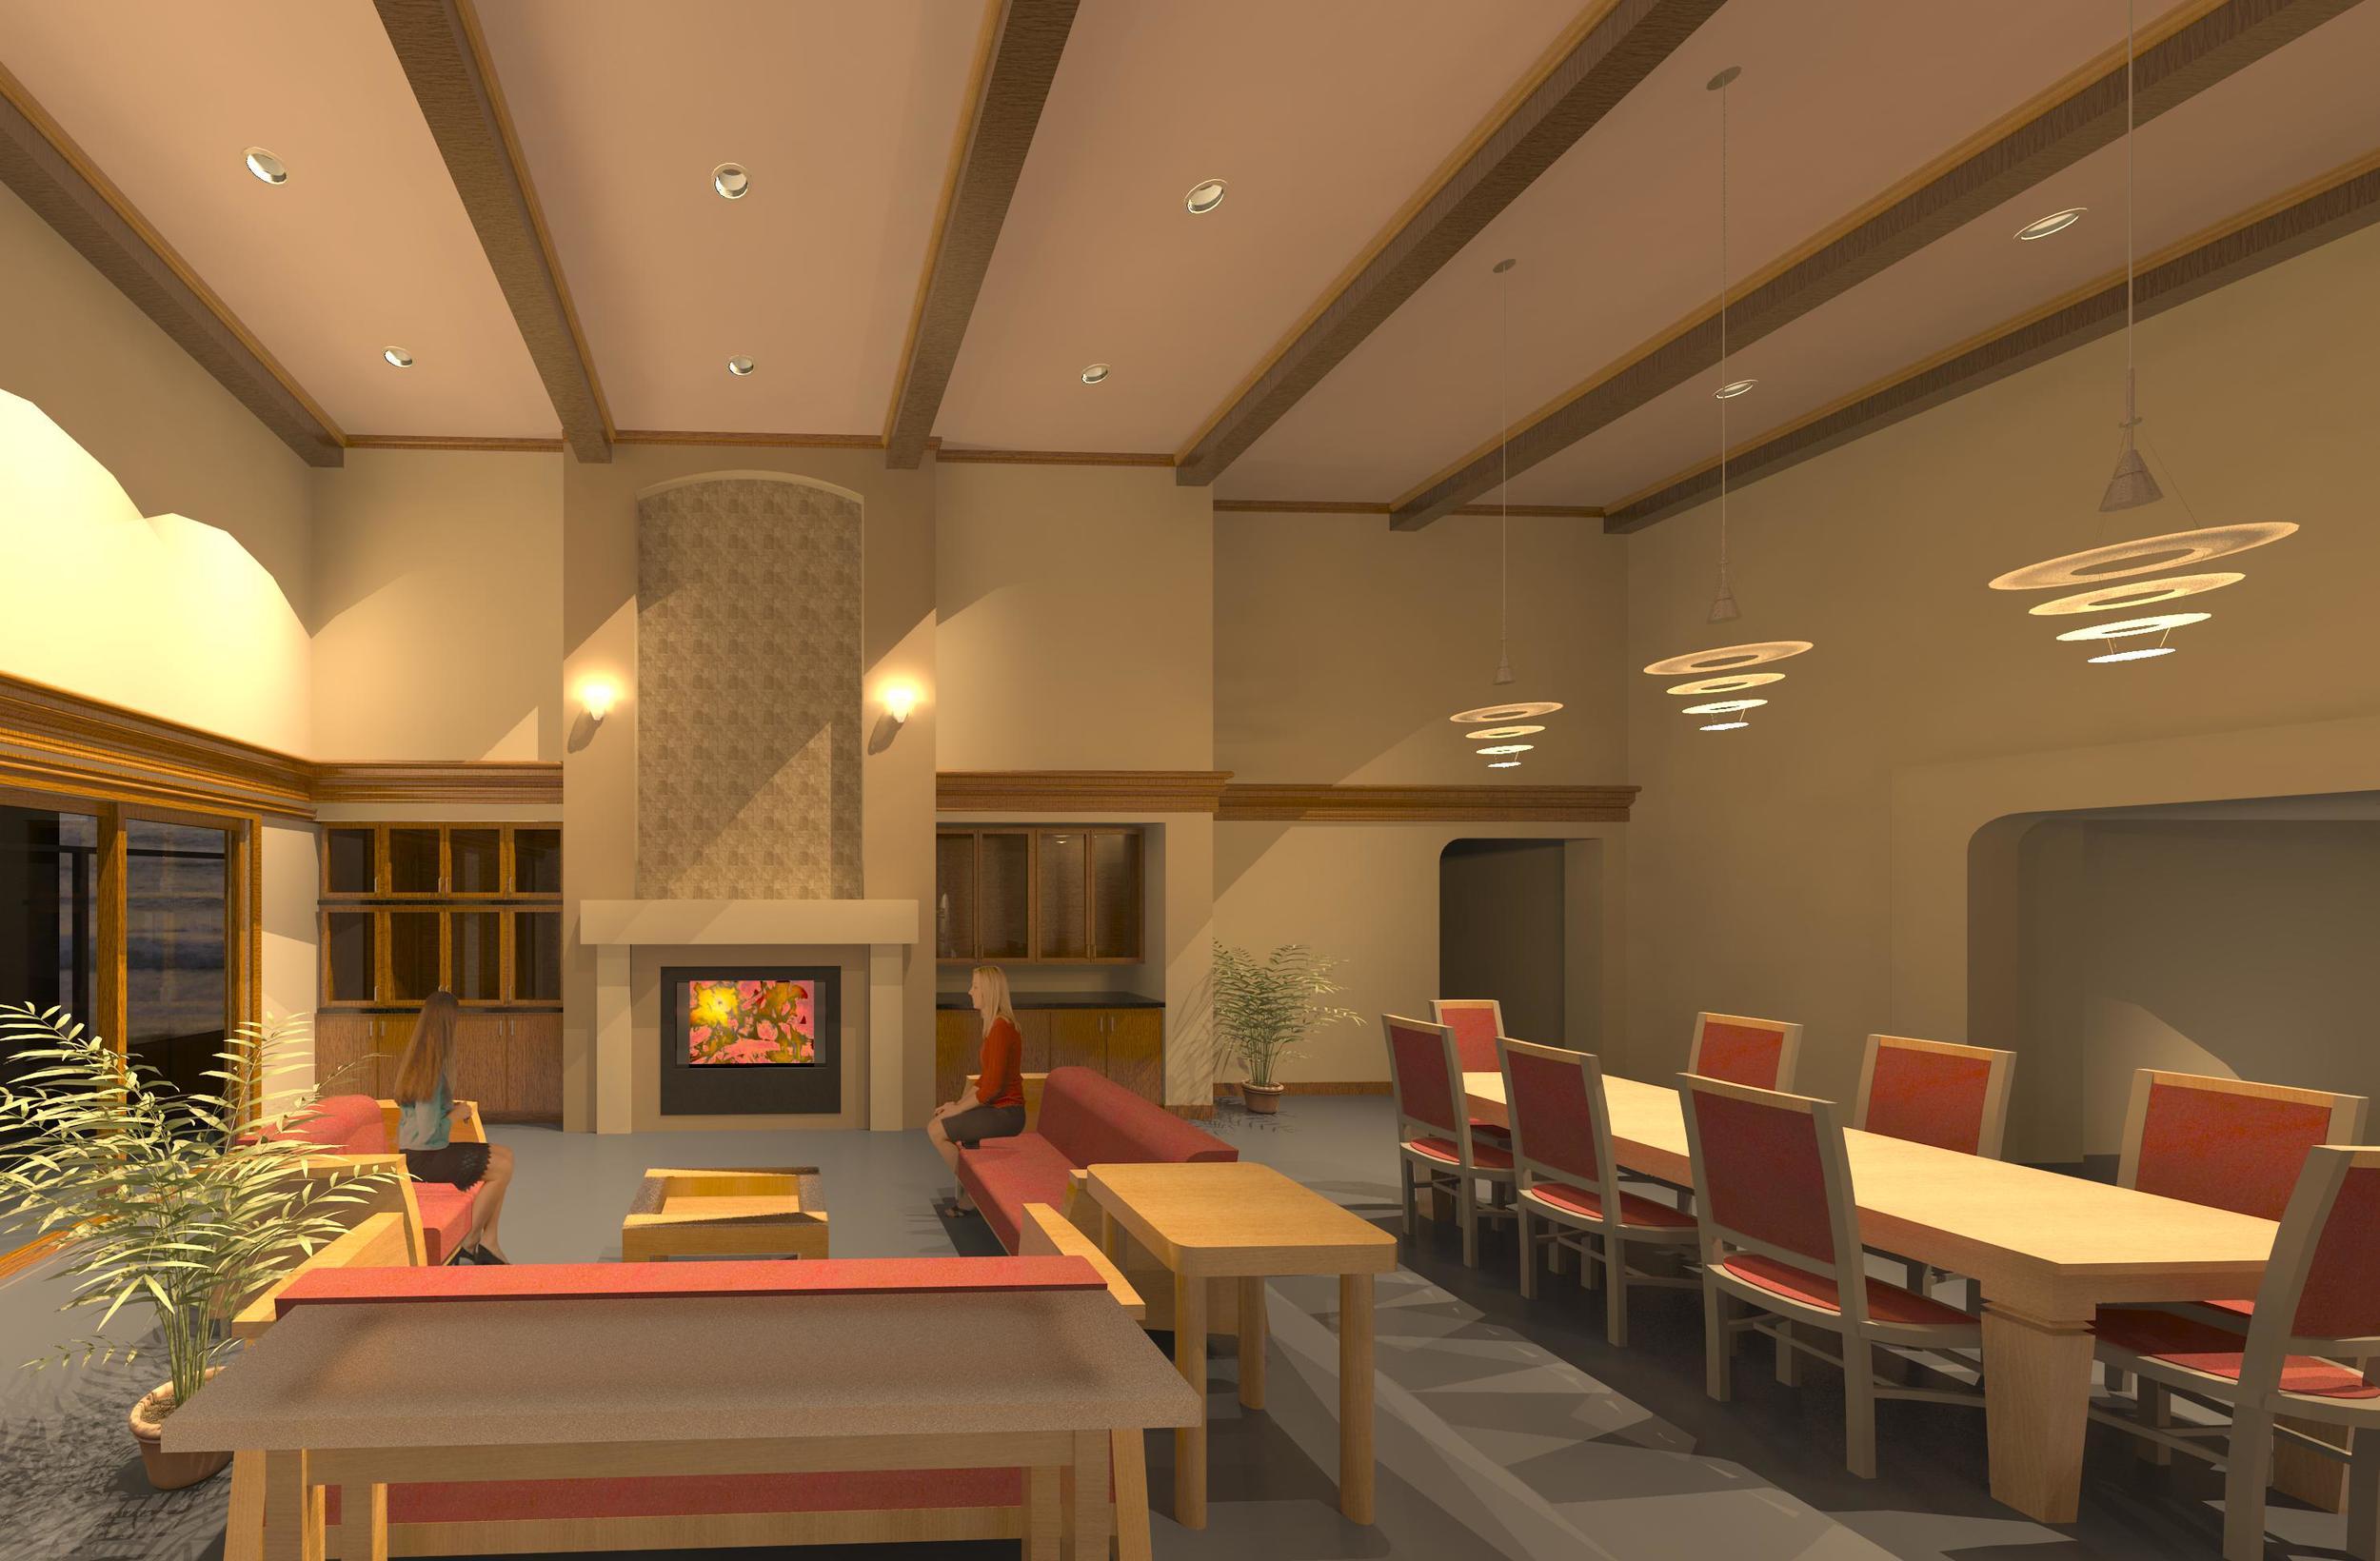 Living Room View of Fireplace (High 150 DPI).jpg